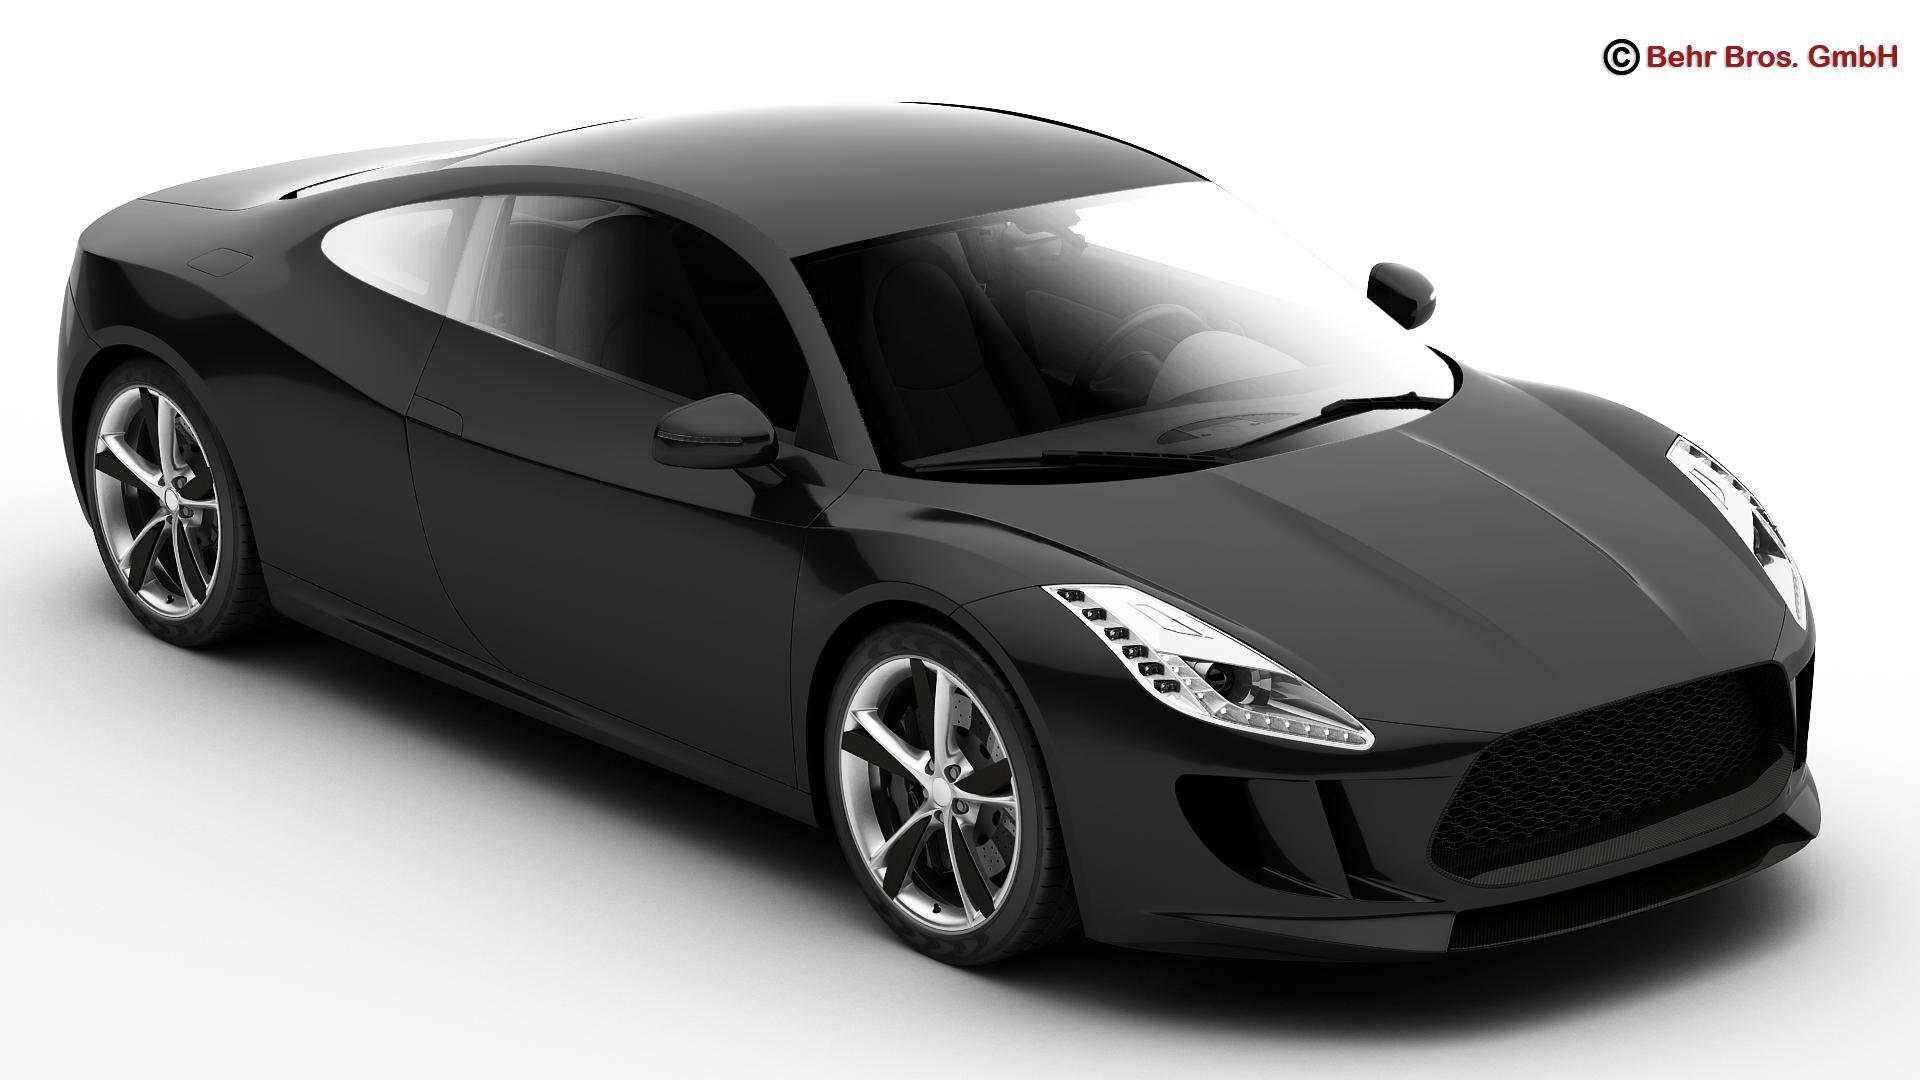 generic sports car 3d model 3ds max fbx c4d lwo ma mb obj 160516